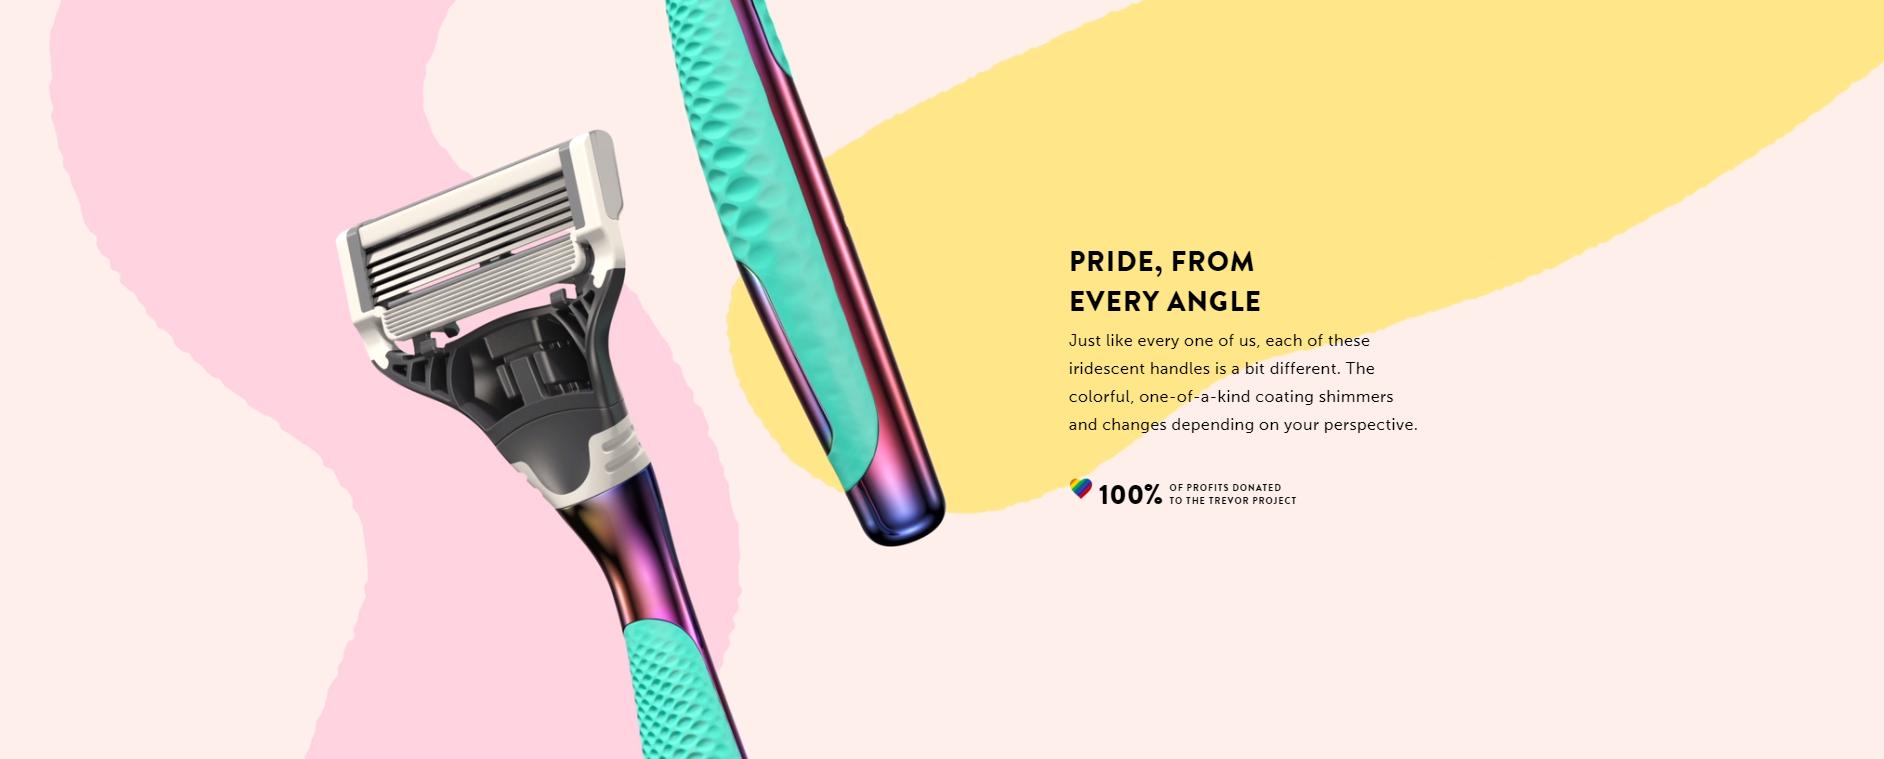 harrys x pride campaign